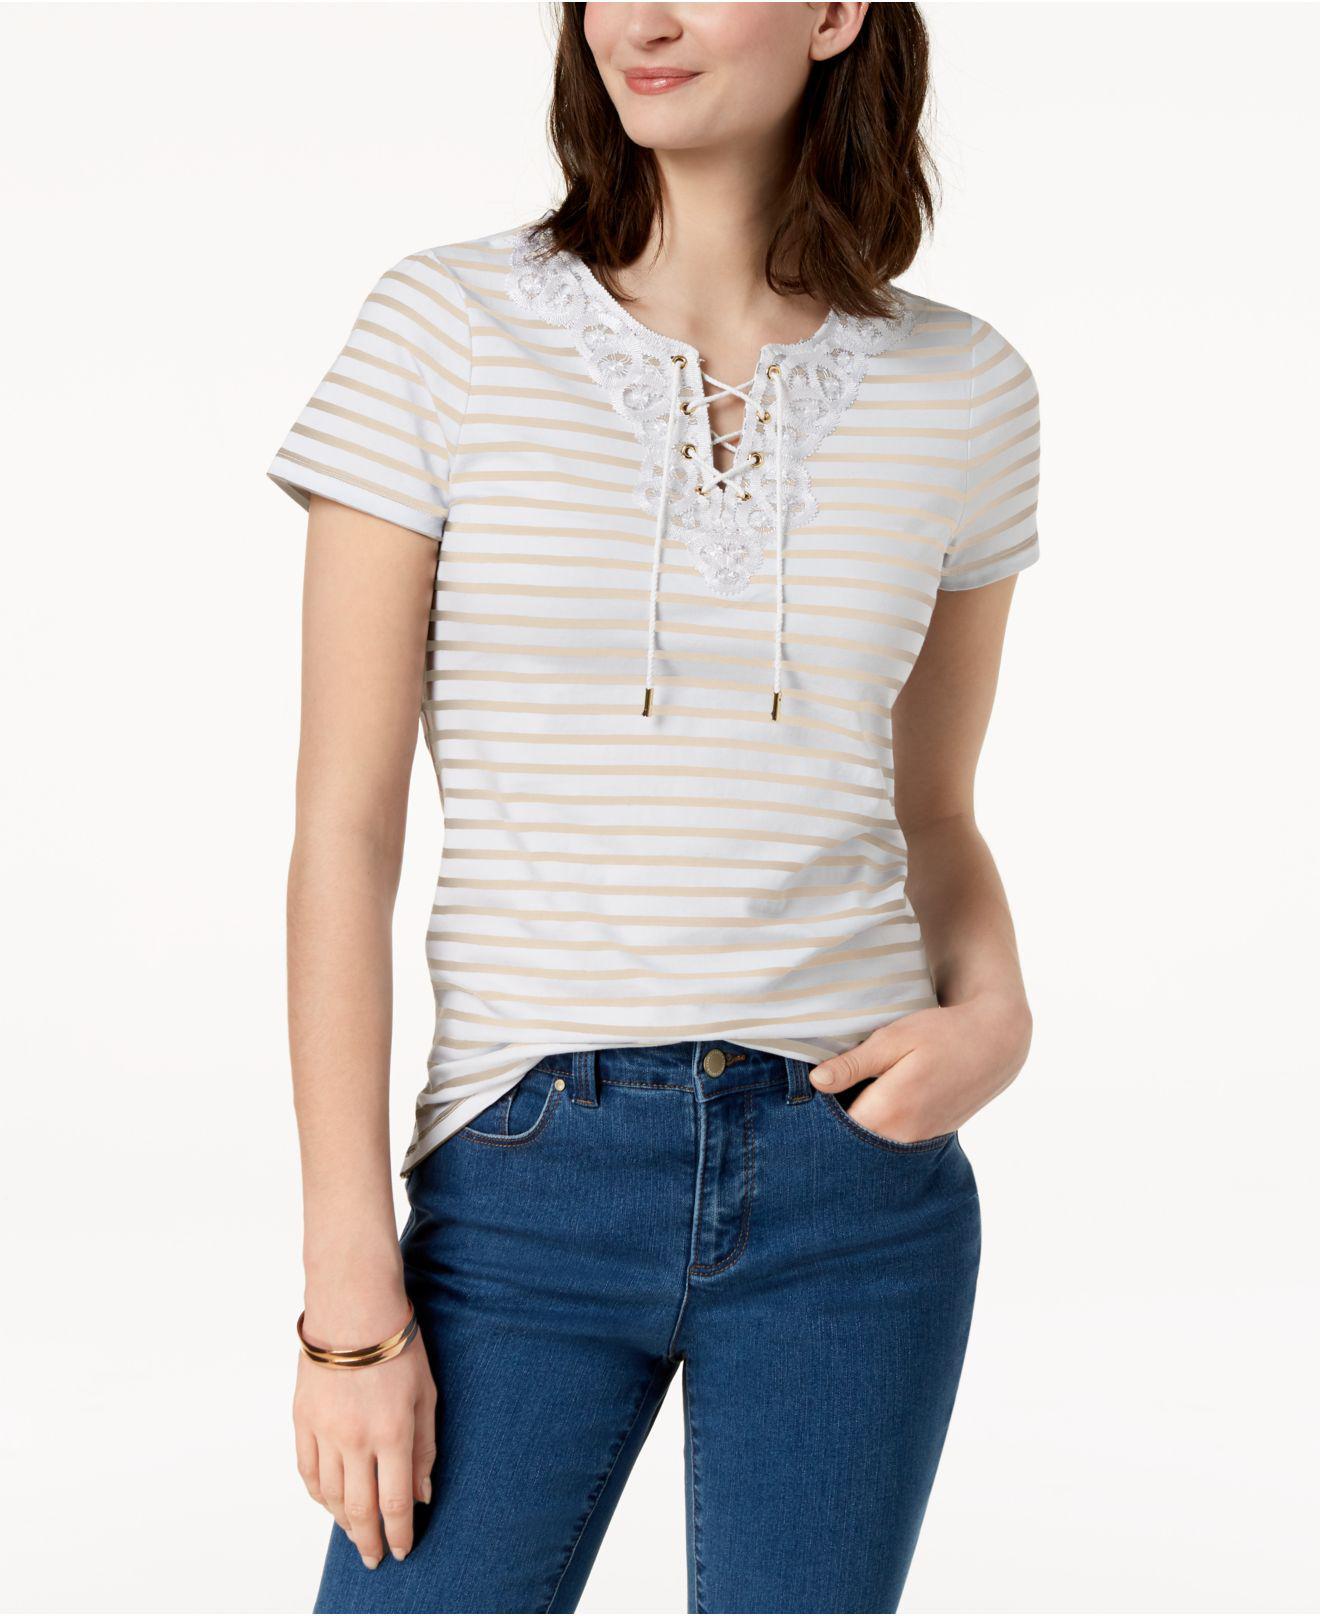 5bfdc219113 Lyst - Charter Club Petite Lace-trim T-shirt